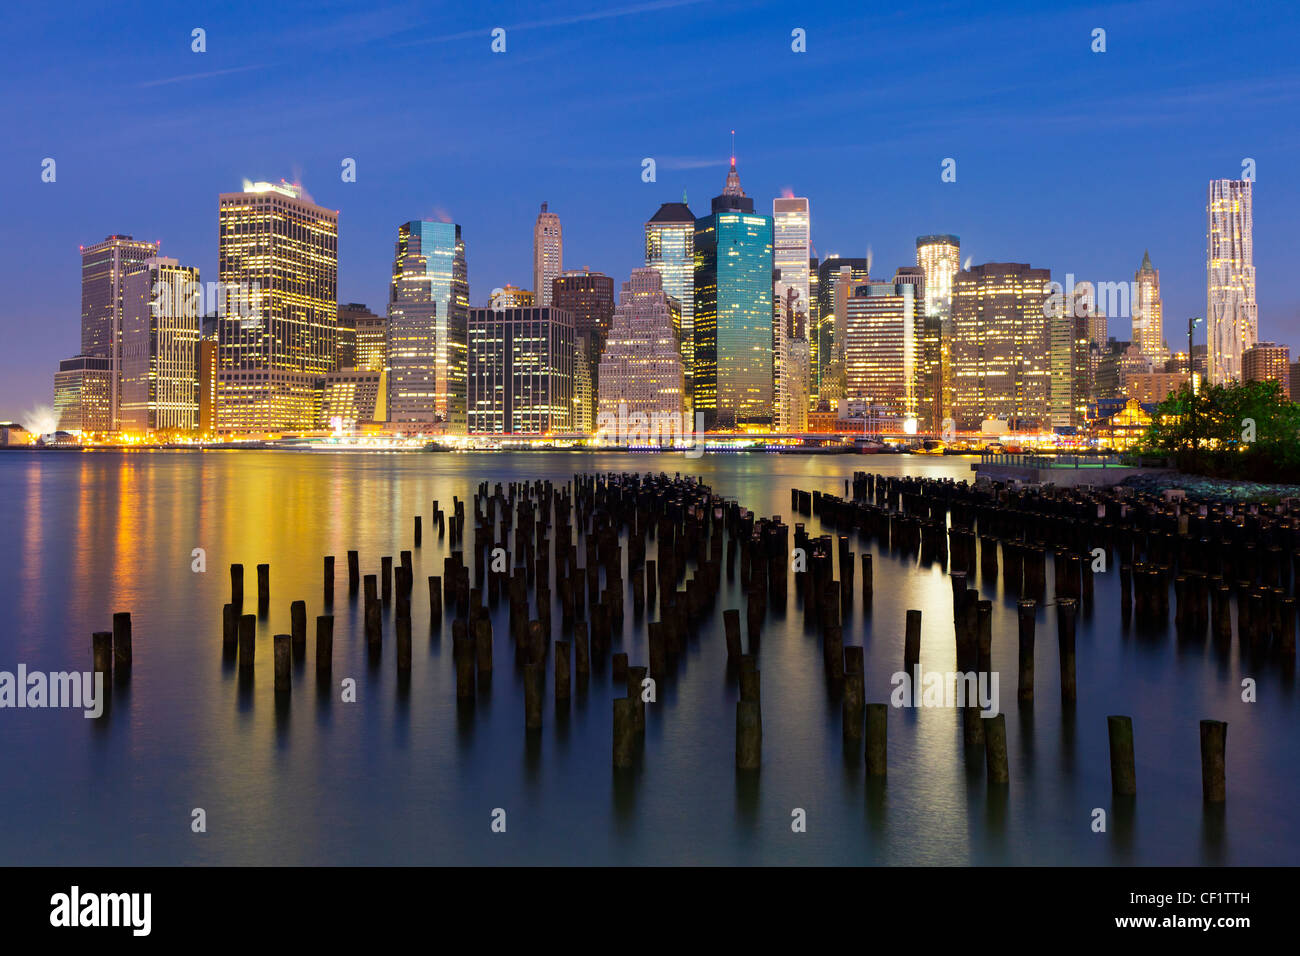 Stati Uniti d'America, New York, crepuscolo vista dei grattacieli di Manhattan da Brooklyn Heights quartiere. Immagini Stock